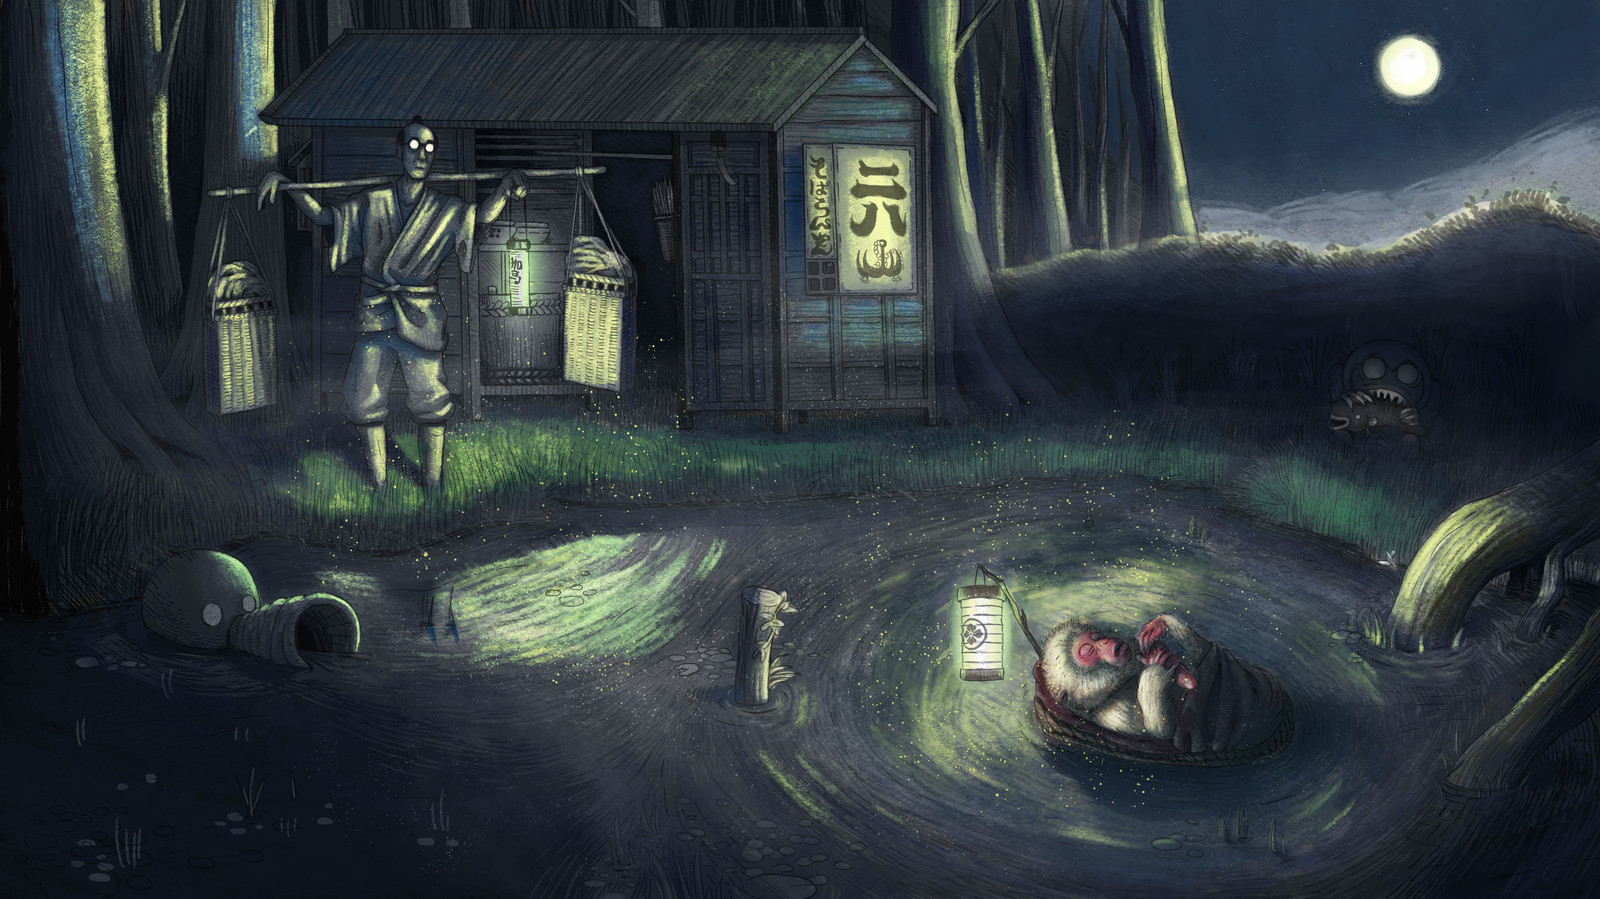 Feudal Japan: The Shogunate - Keyframe entry